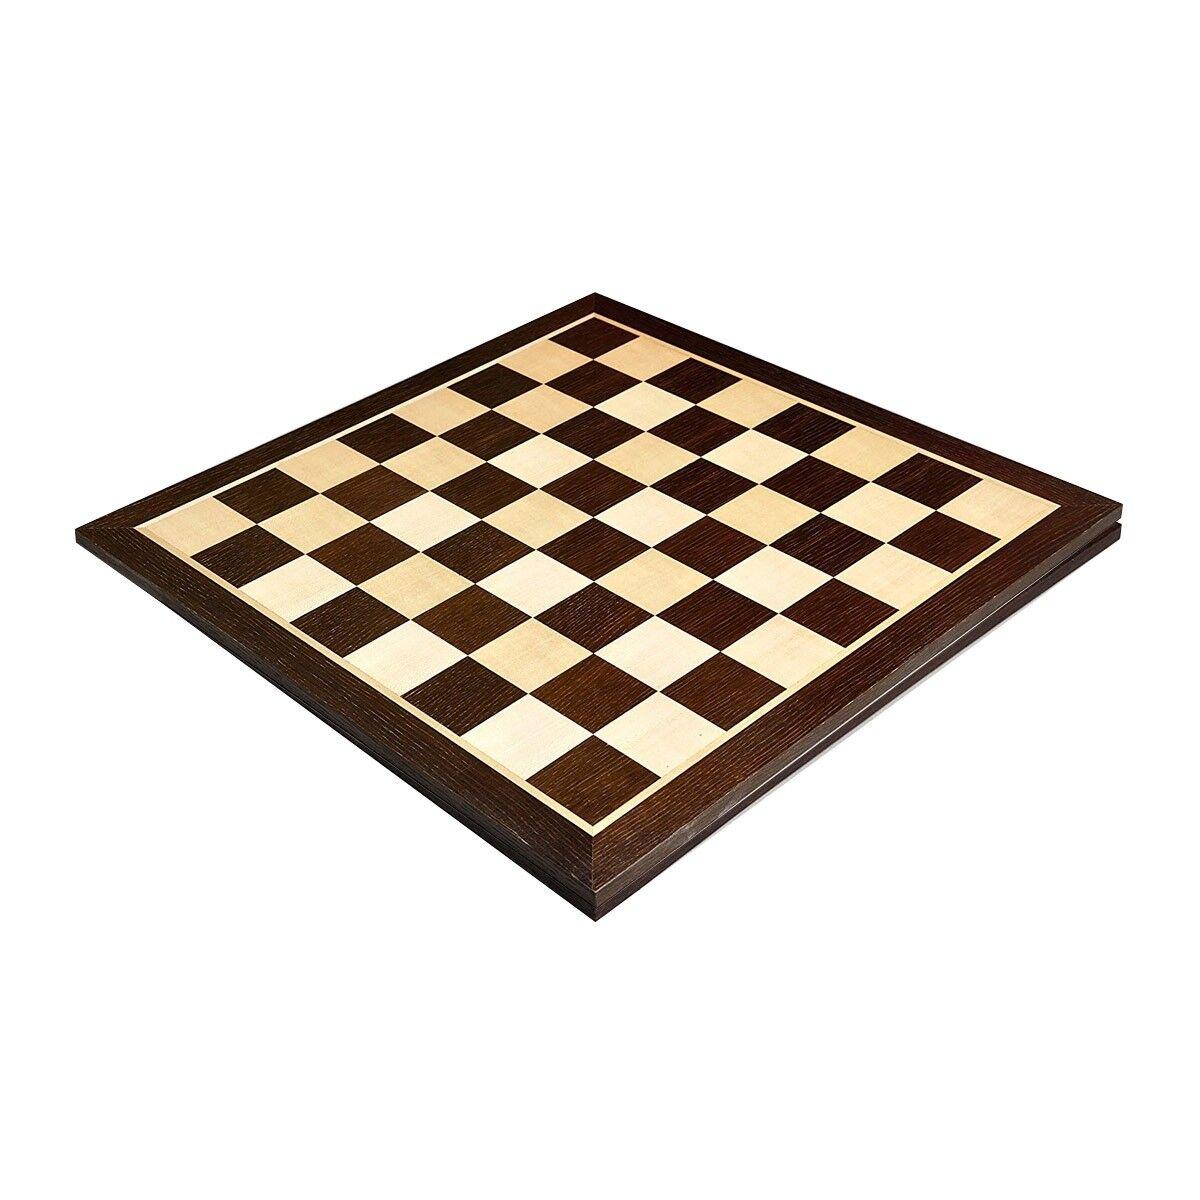 Smoked Oak & Maple Wooden Chess Board - 2.25